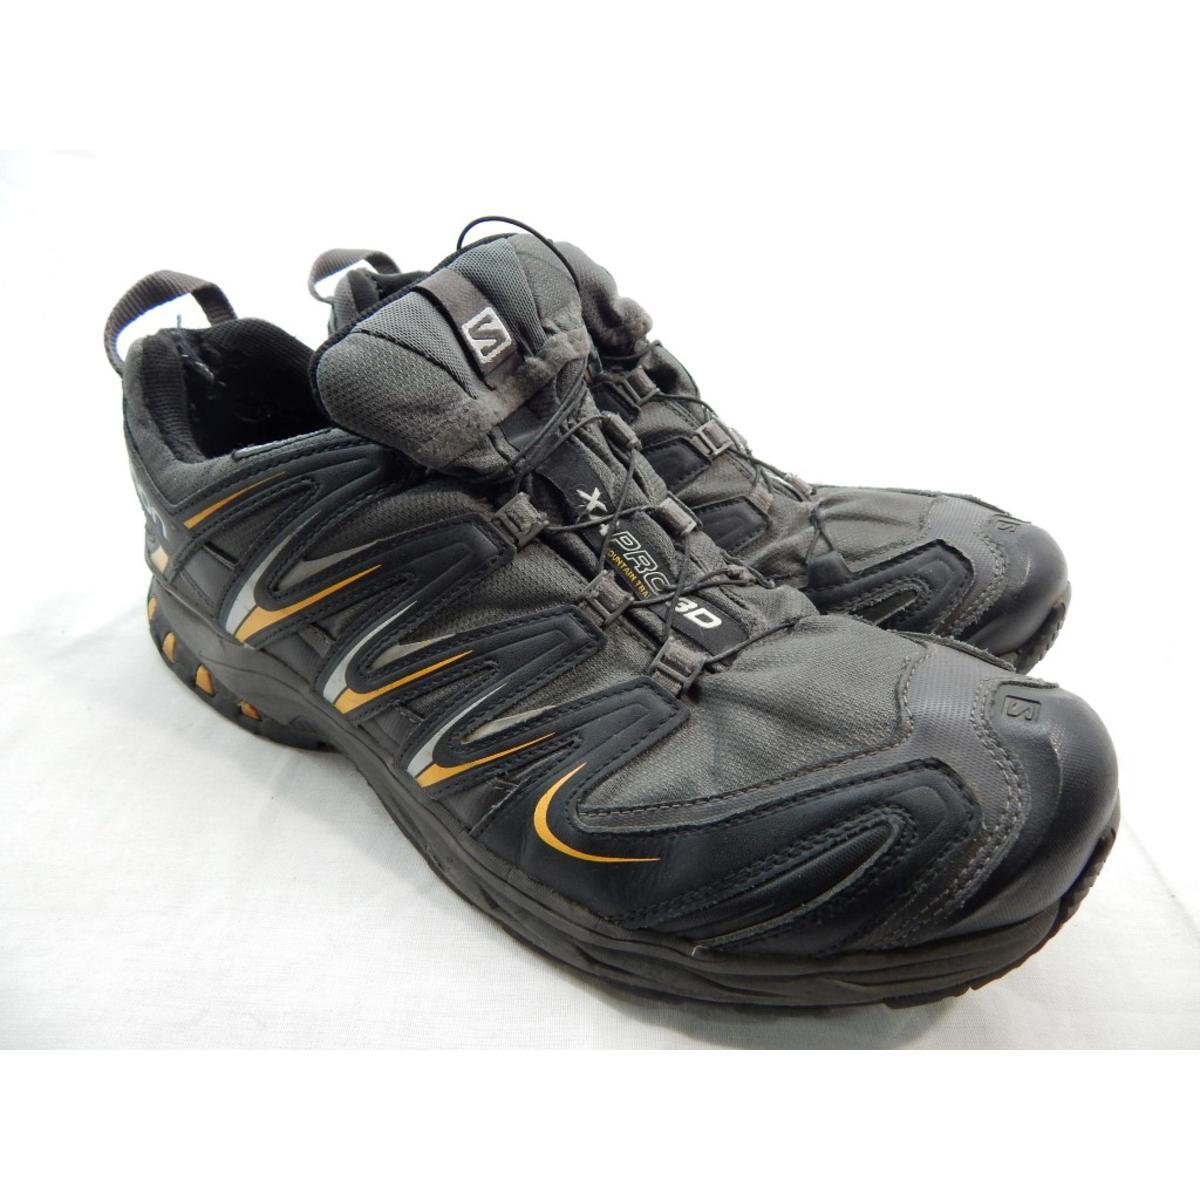 Salomon X Ultra 2 GTX Men's AutobahnBlackTomato Red Hiking Shoe 14M